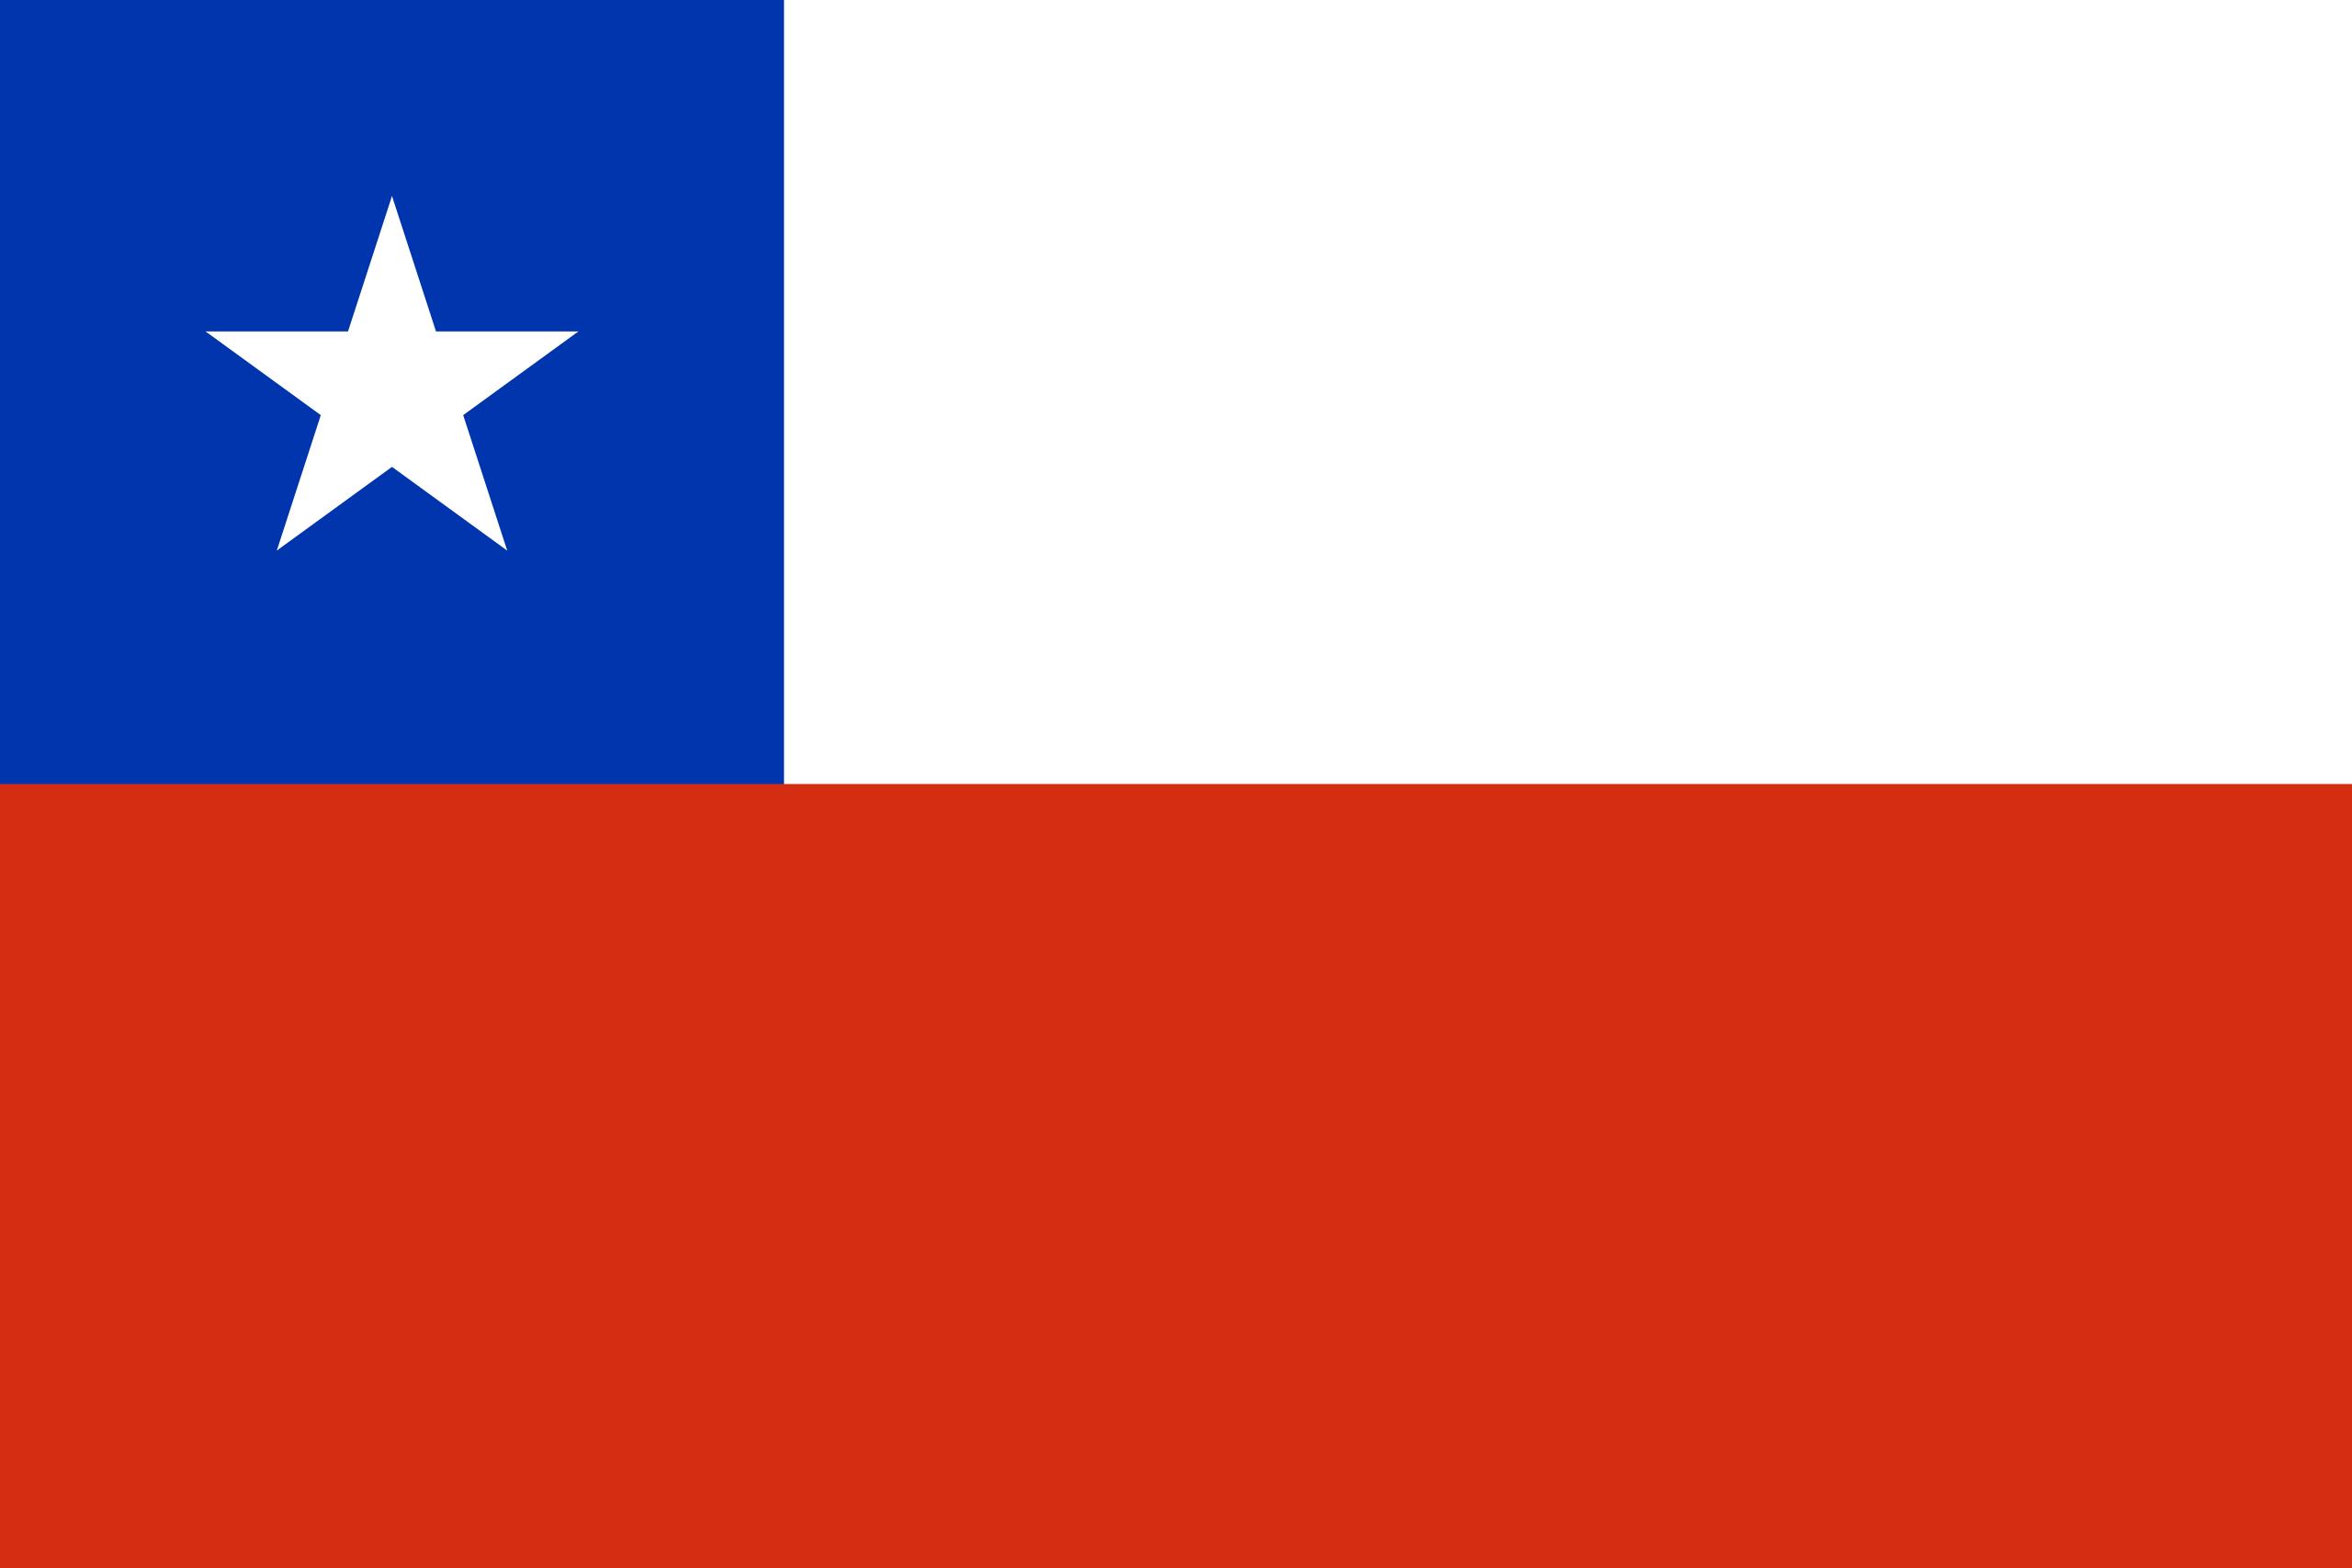 Чили, страна, Эмблема, логотип, символ - Обои HD - Профессор falken.com